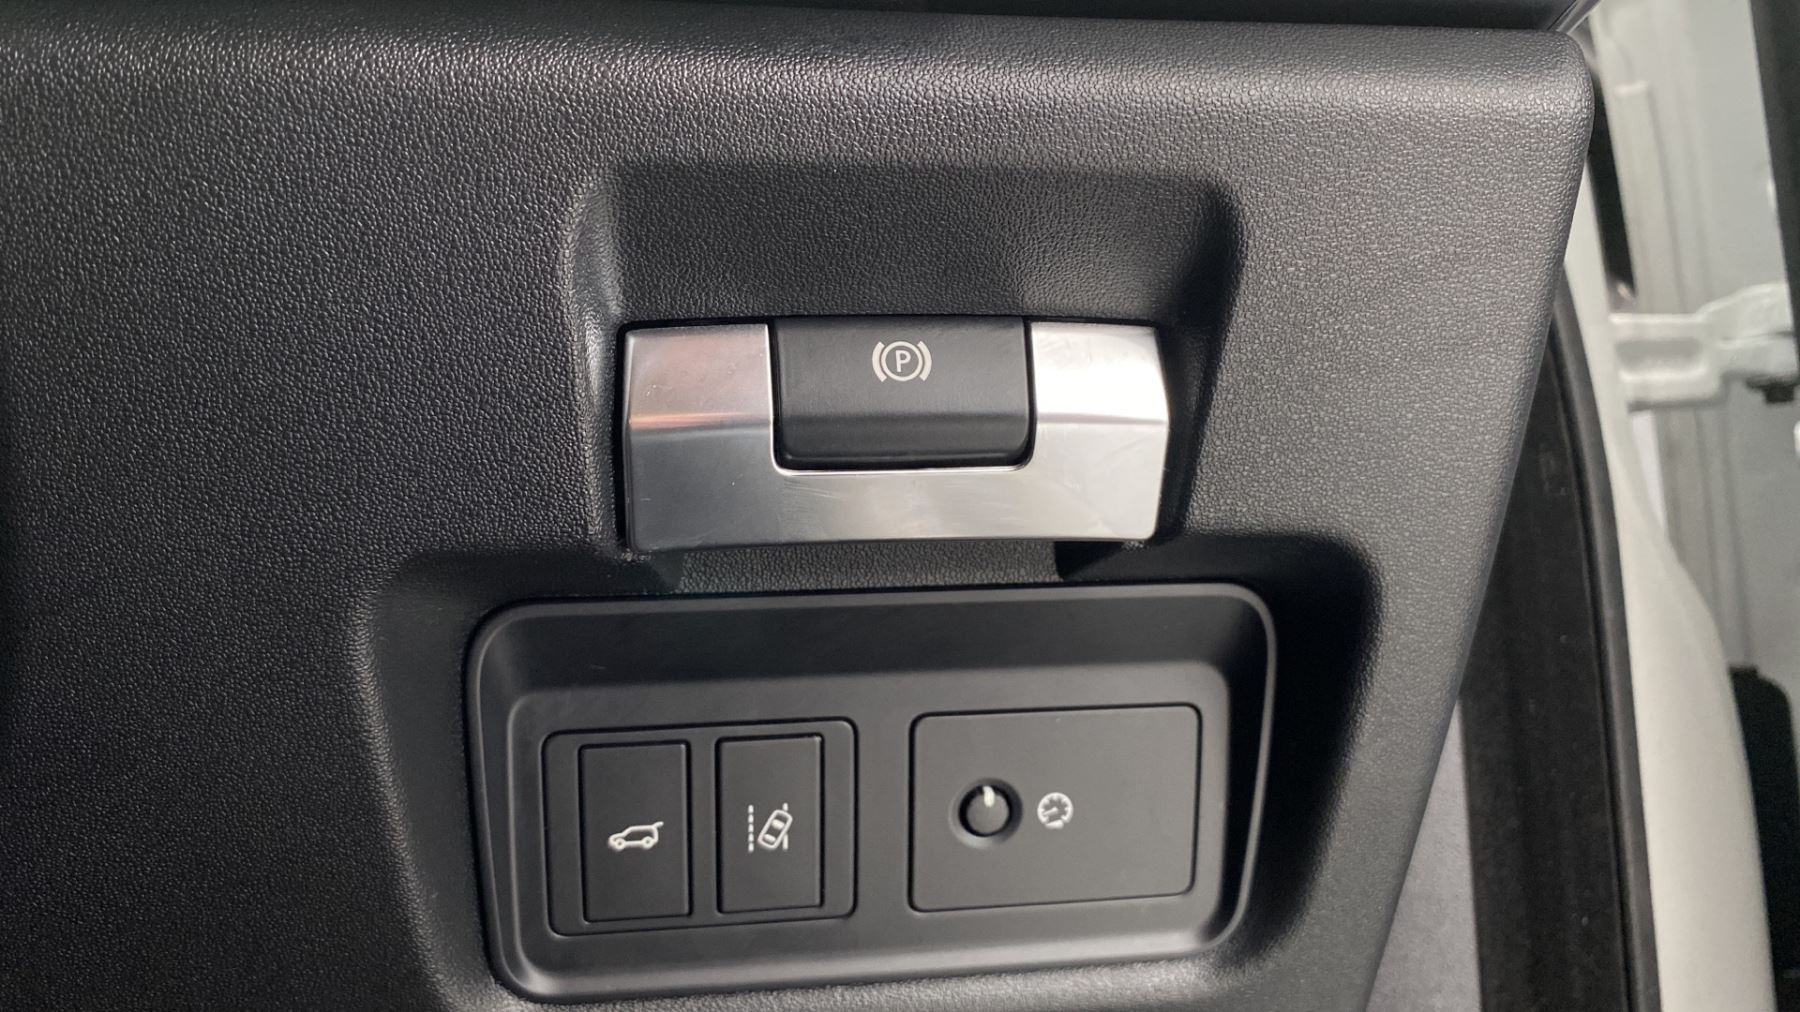 Jaguar E-PACE 2.0d SE AWD - Meridian Sound System - Powered Seats - Satellite Navigation image 26